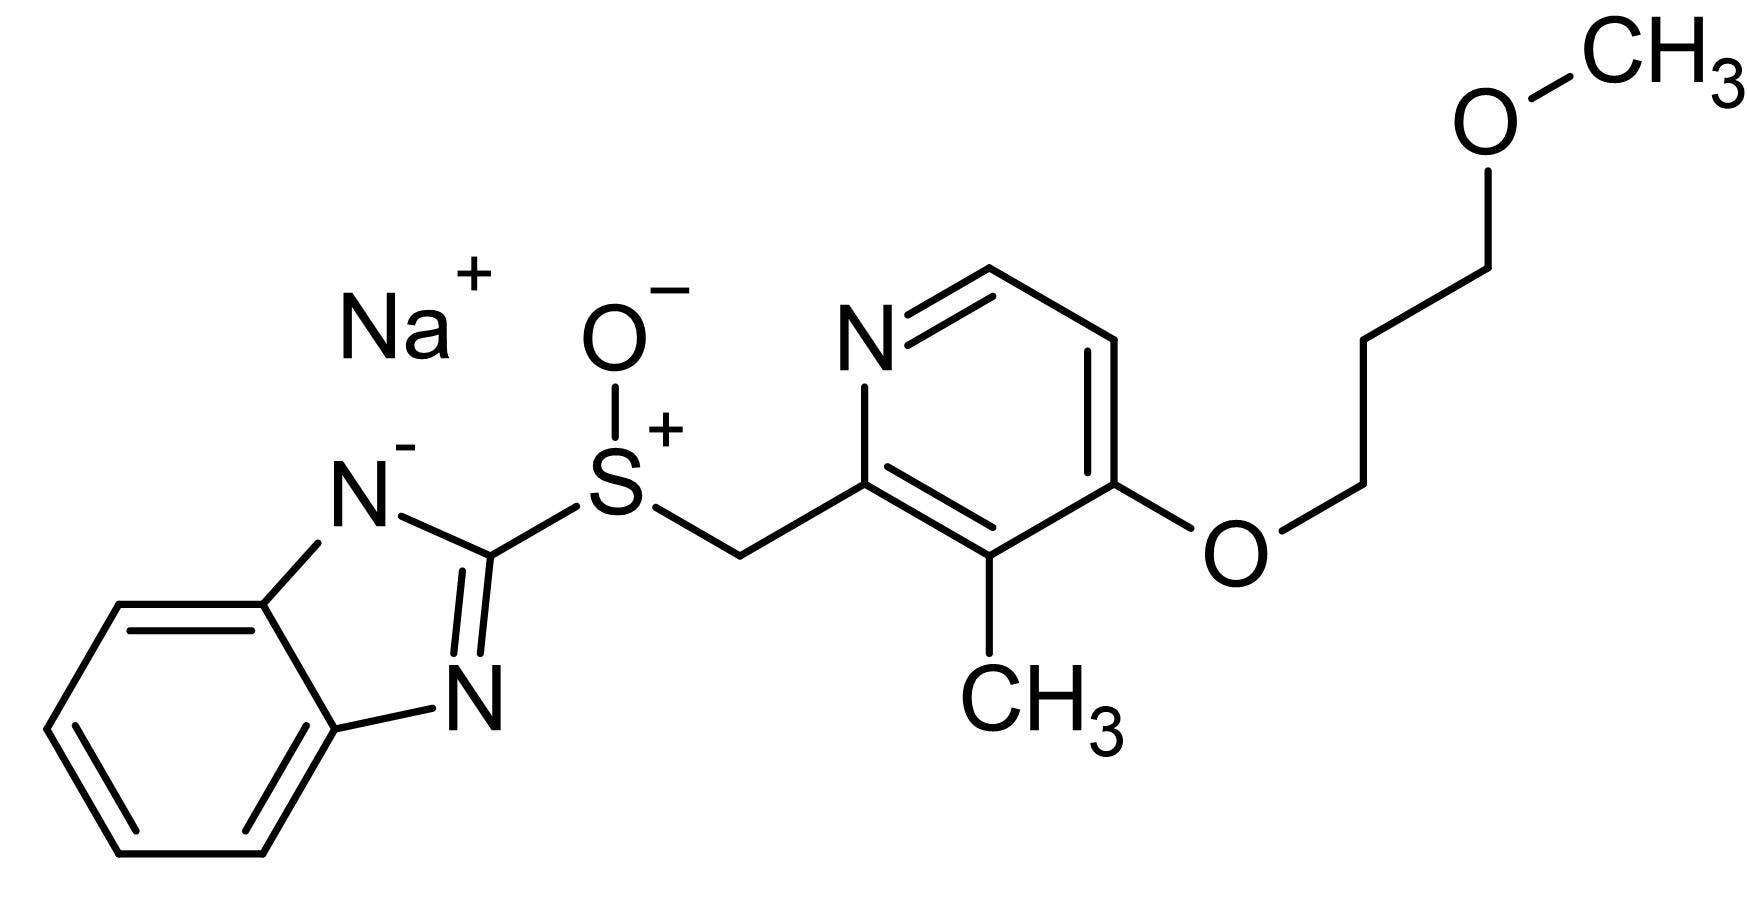 Chemical Structure - Rabeprazole sodium salt, gastric H<sup>+</sup>/K<sup>+</sup> ATPase pump inhibitor (ab143690)